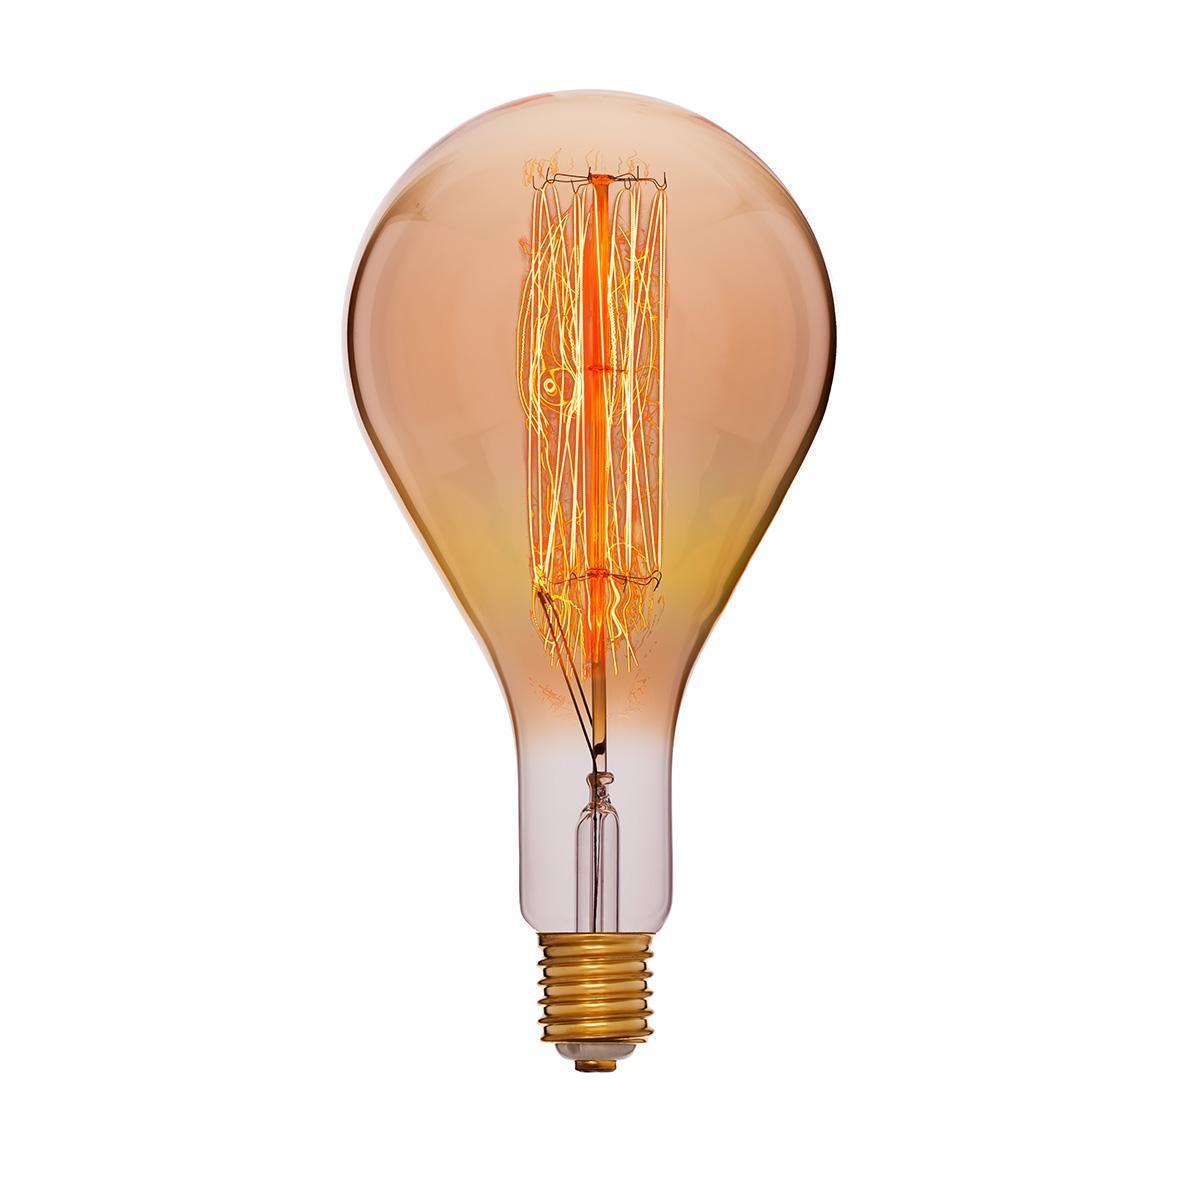 Лампа накаливания E40 95W прозрачная 054-119 лампа металогалогенная 04129 e40 400w 4000к труба прозрачная mh to 400 4000 e40